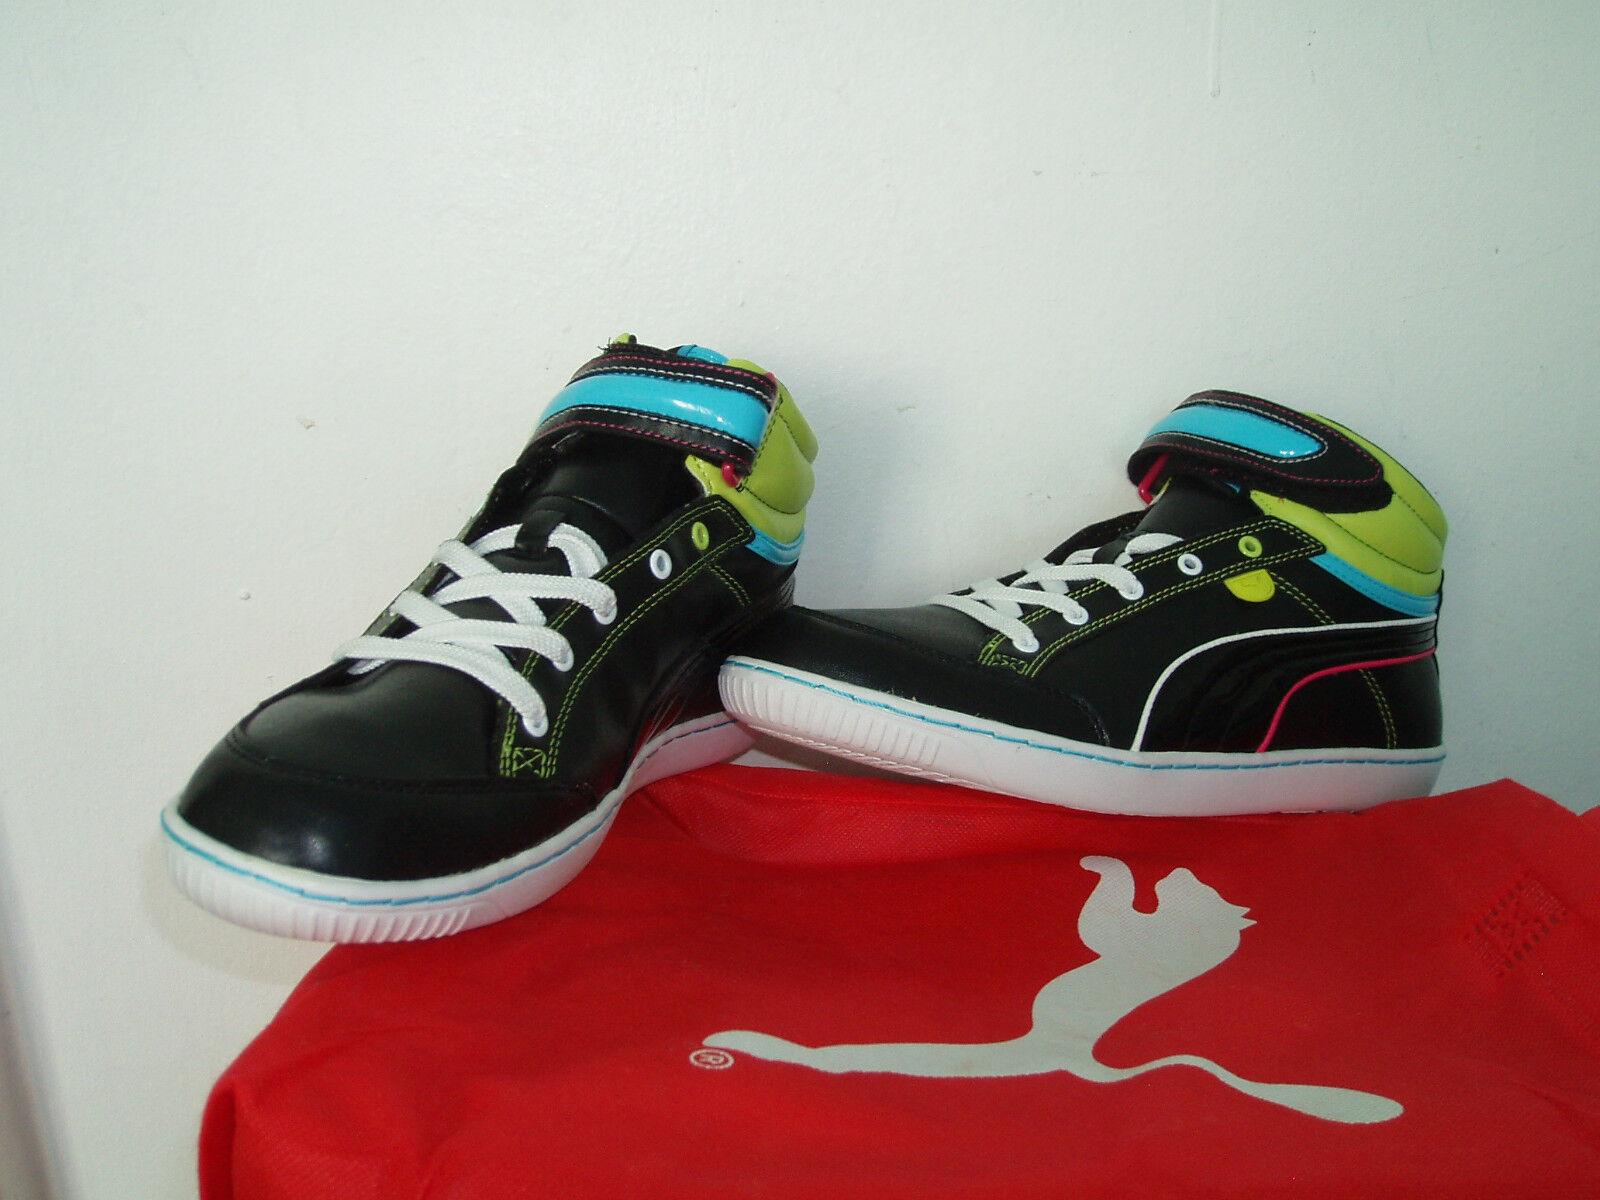 Puma Avila Mid US shoes Size Women's-8, 9.5,,Solid,Medium,Leather (353793 02)